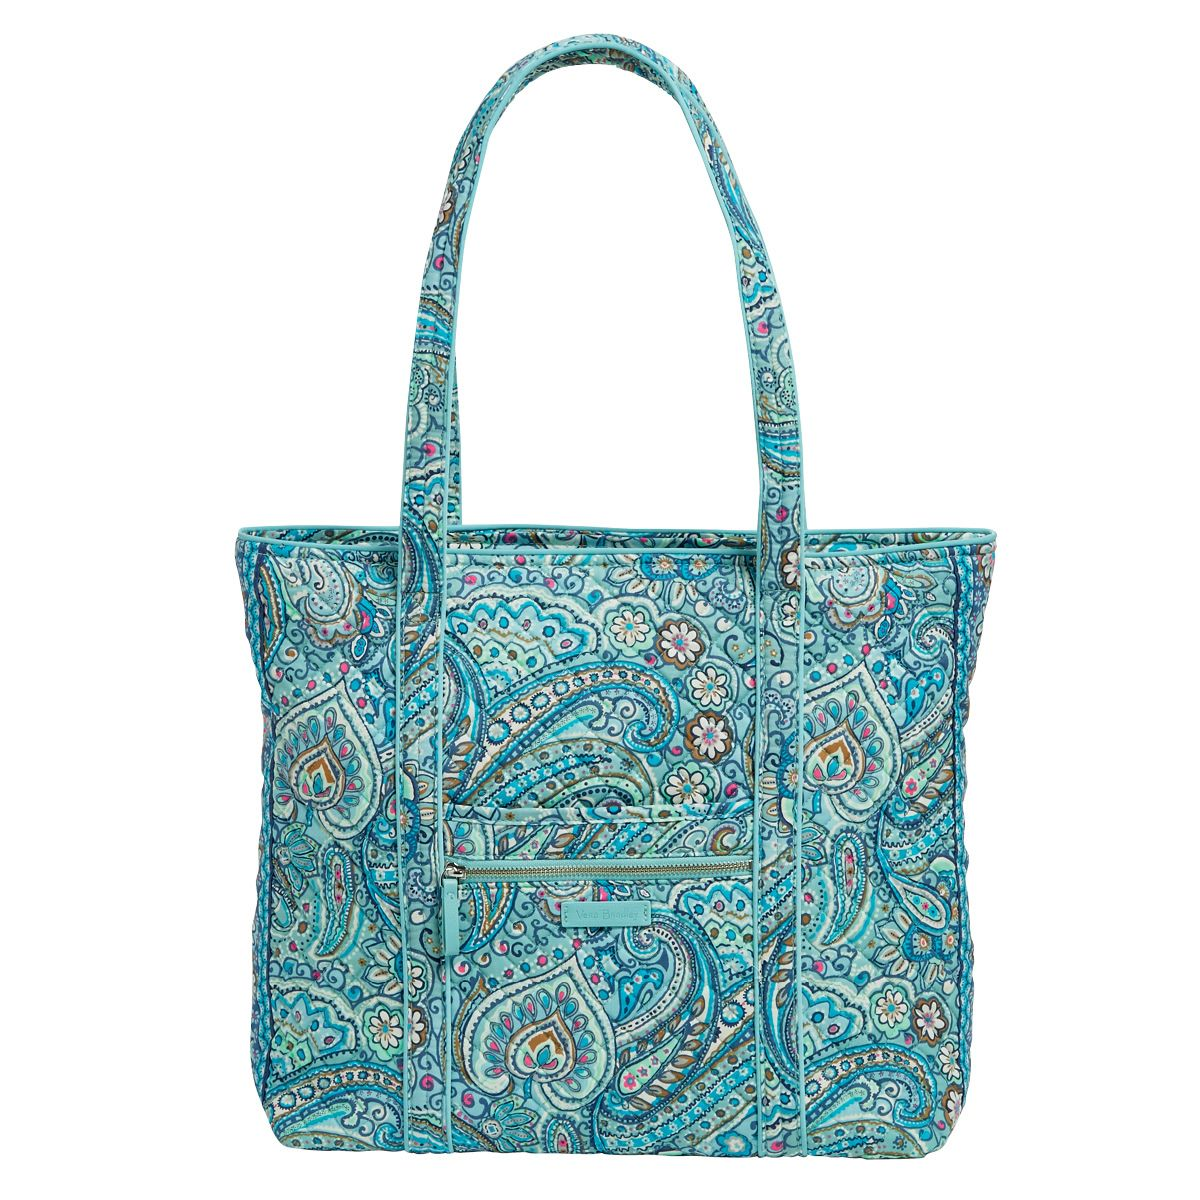 7d29d79c02edb Vera Bradley Tote Bags - Macy s